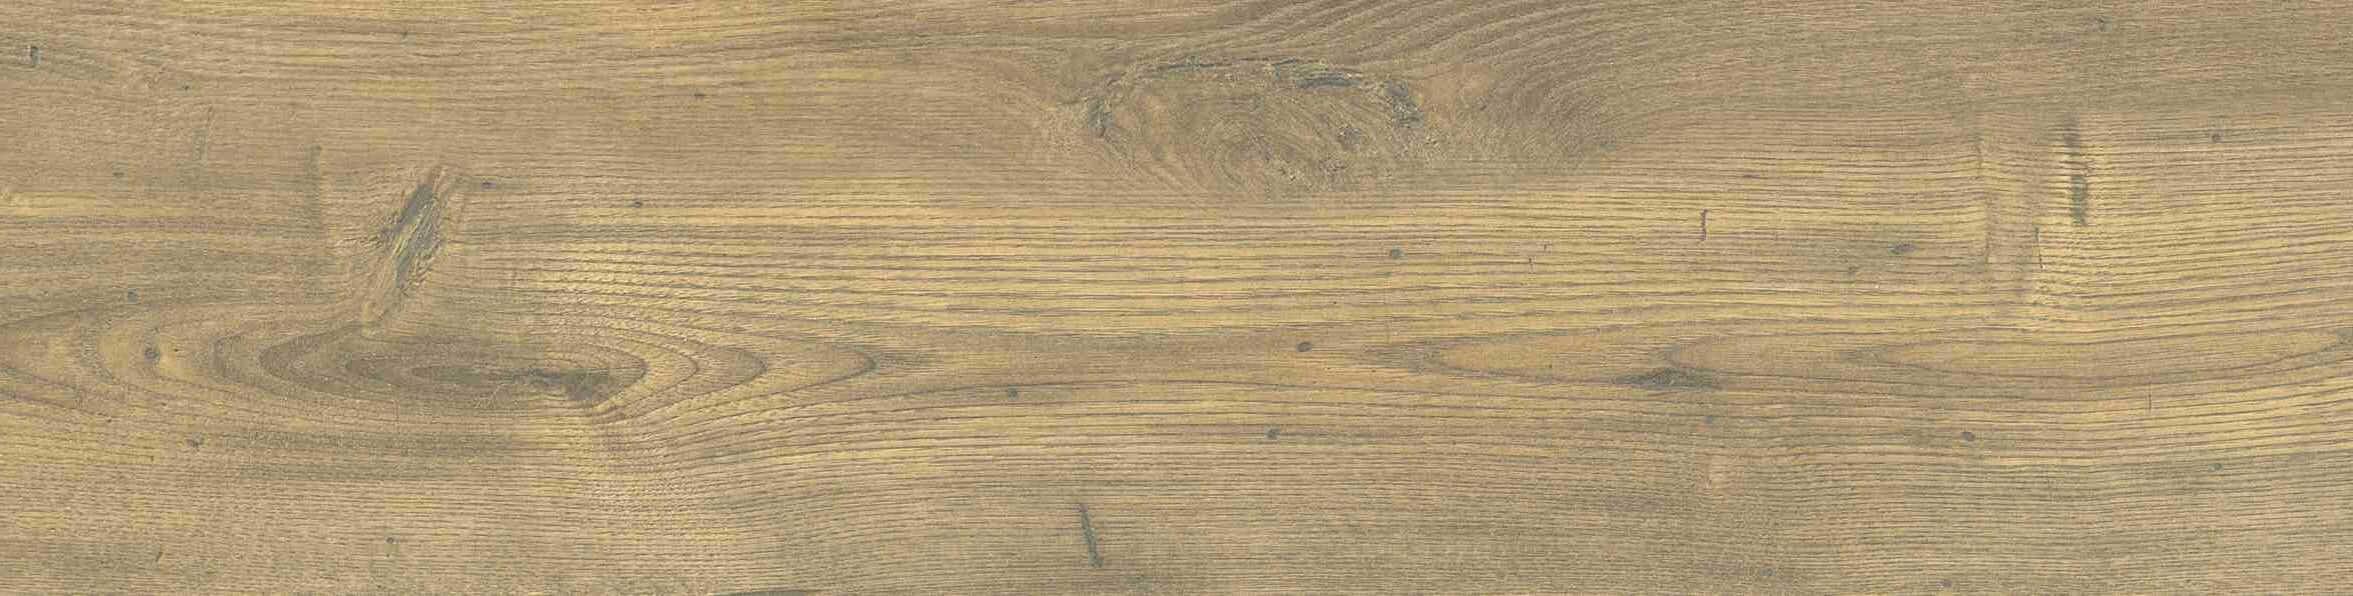 GRES OSLO BEIGE 15,5x62 GAT. I